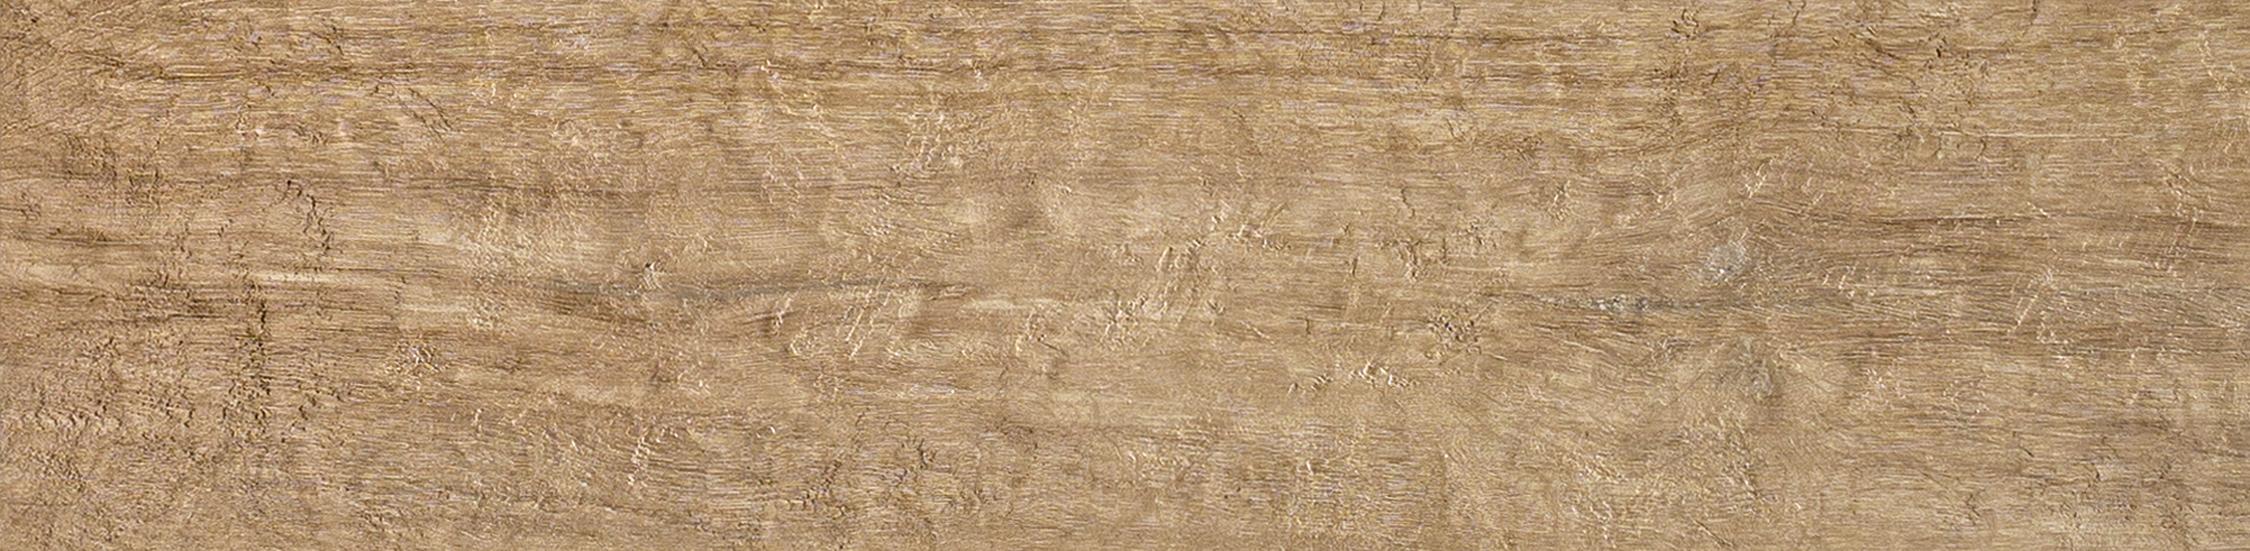 natural_life_wood_olive_22x90_grip